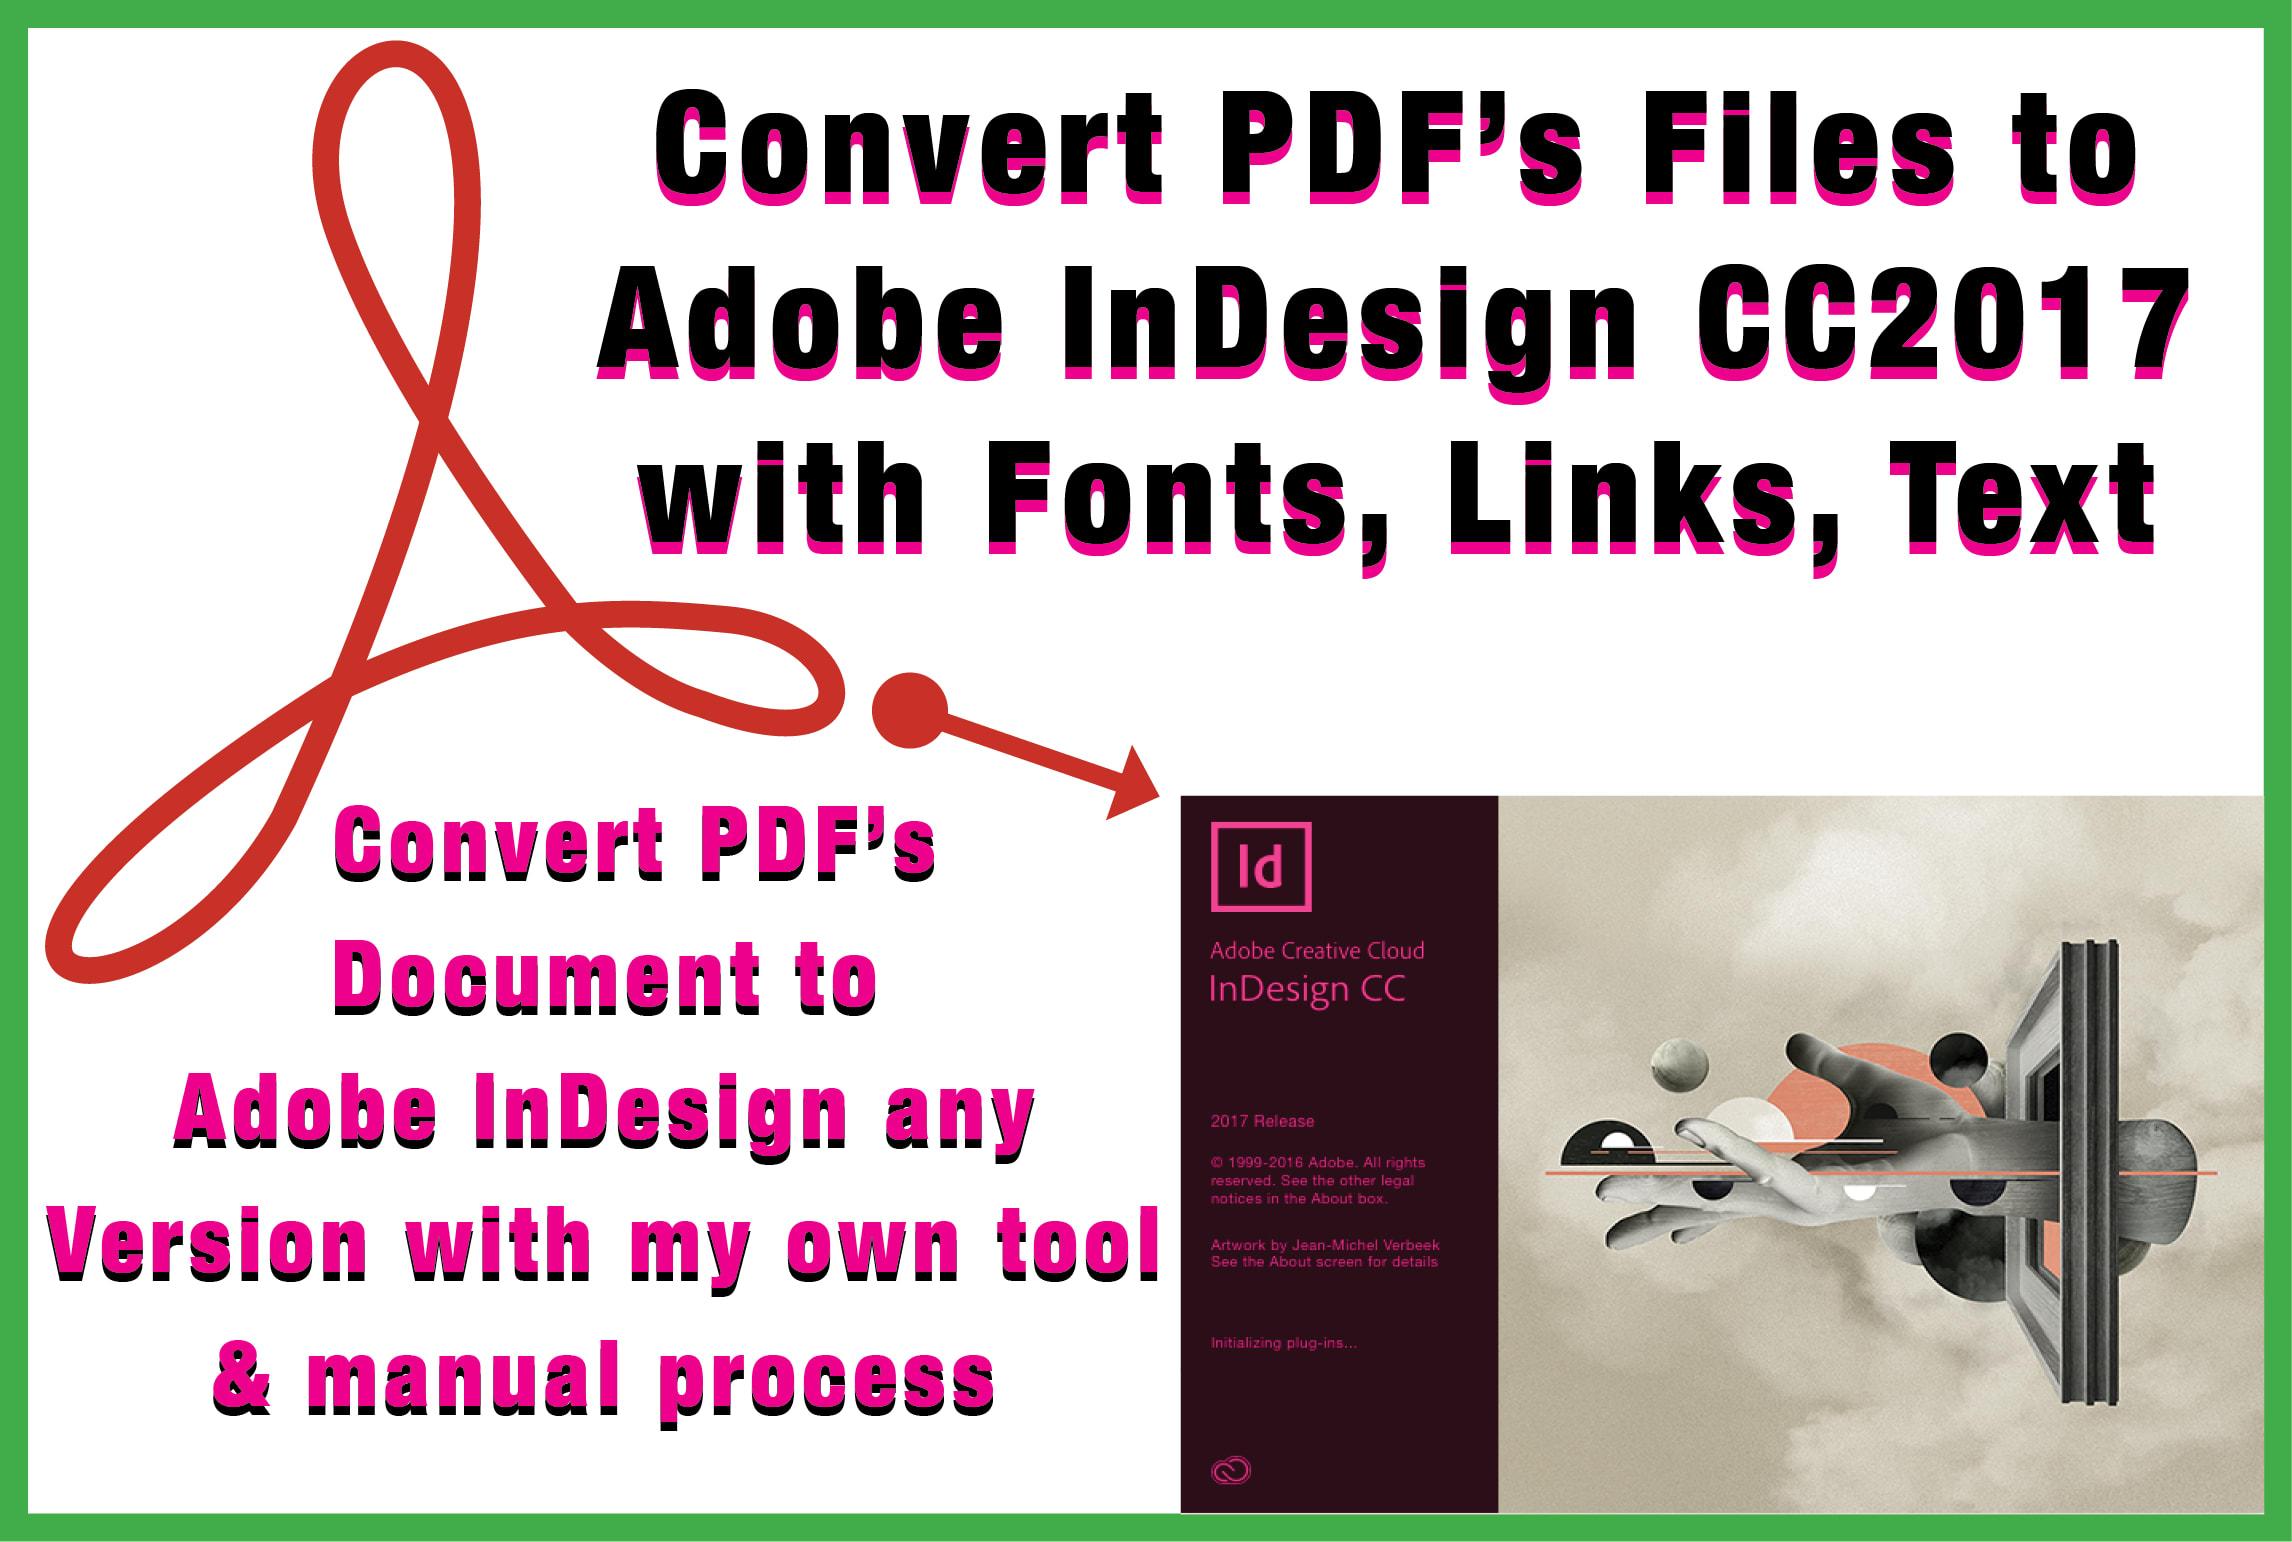 convert PDF files to adobe indesign cc2017